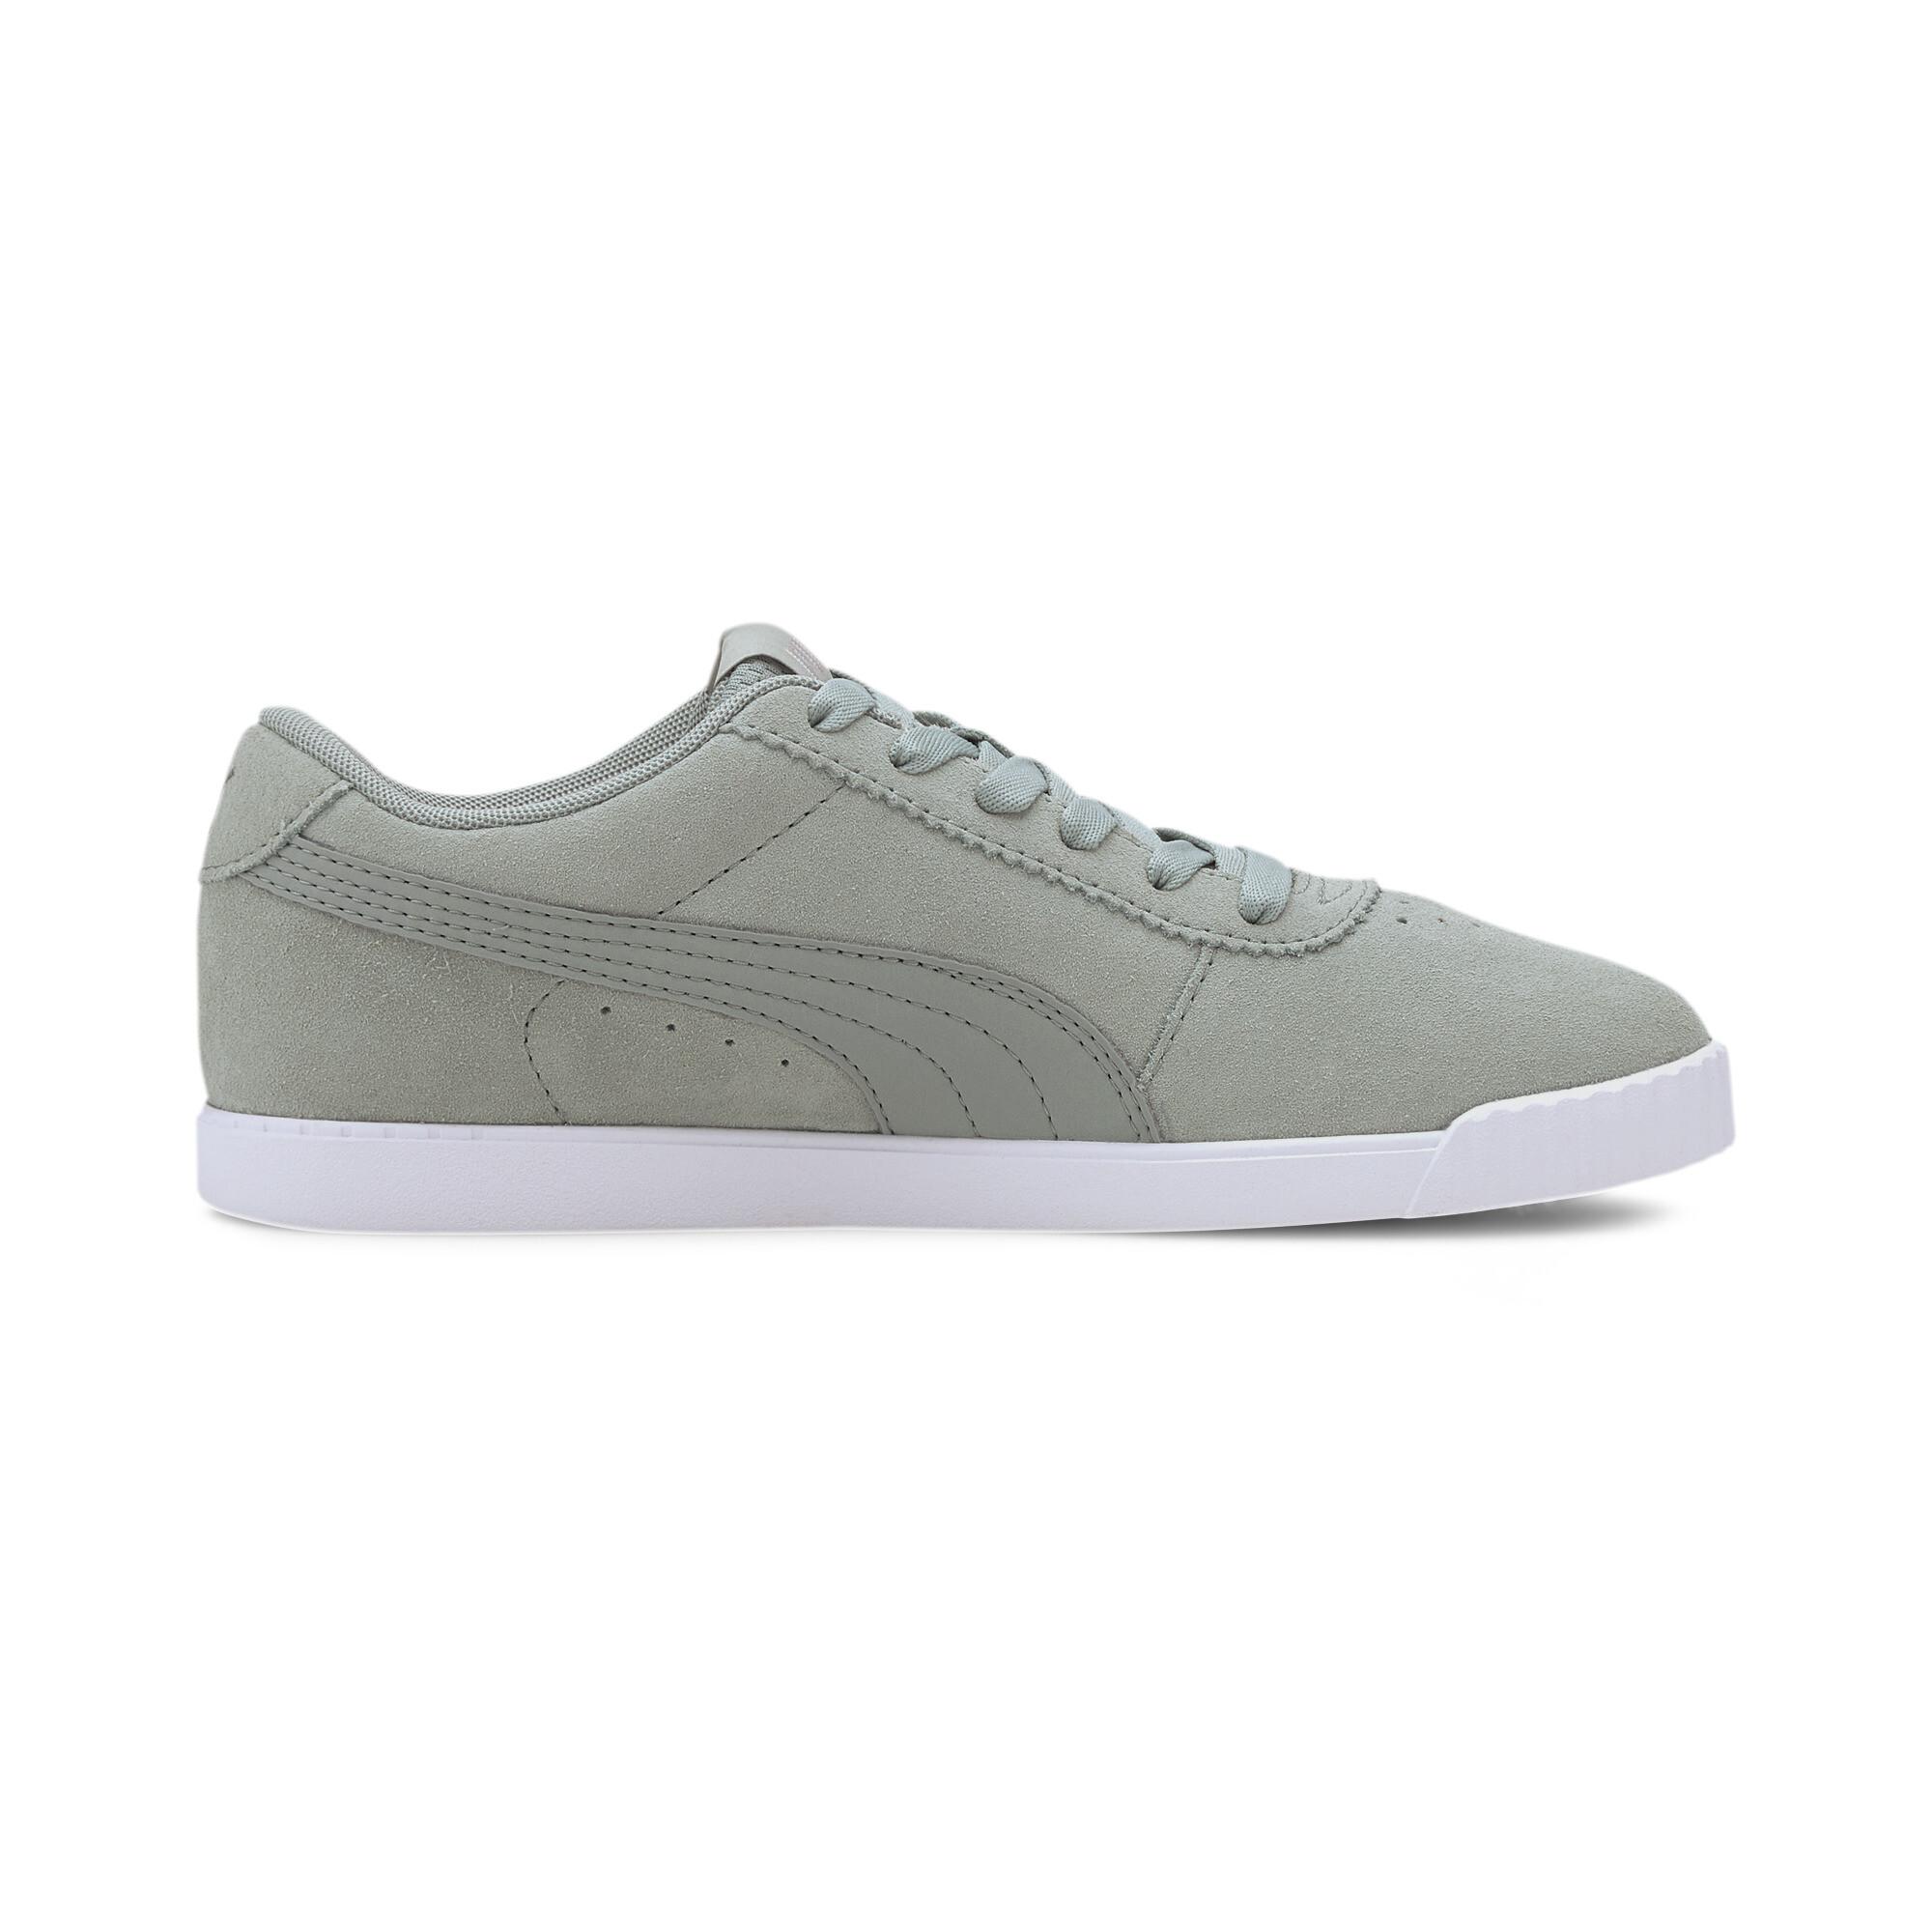 PUMA-Women-039-s-Carina-Slim-Suede-Sneakers thumbnail 27